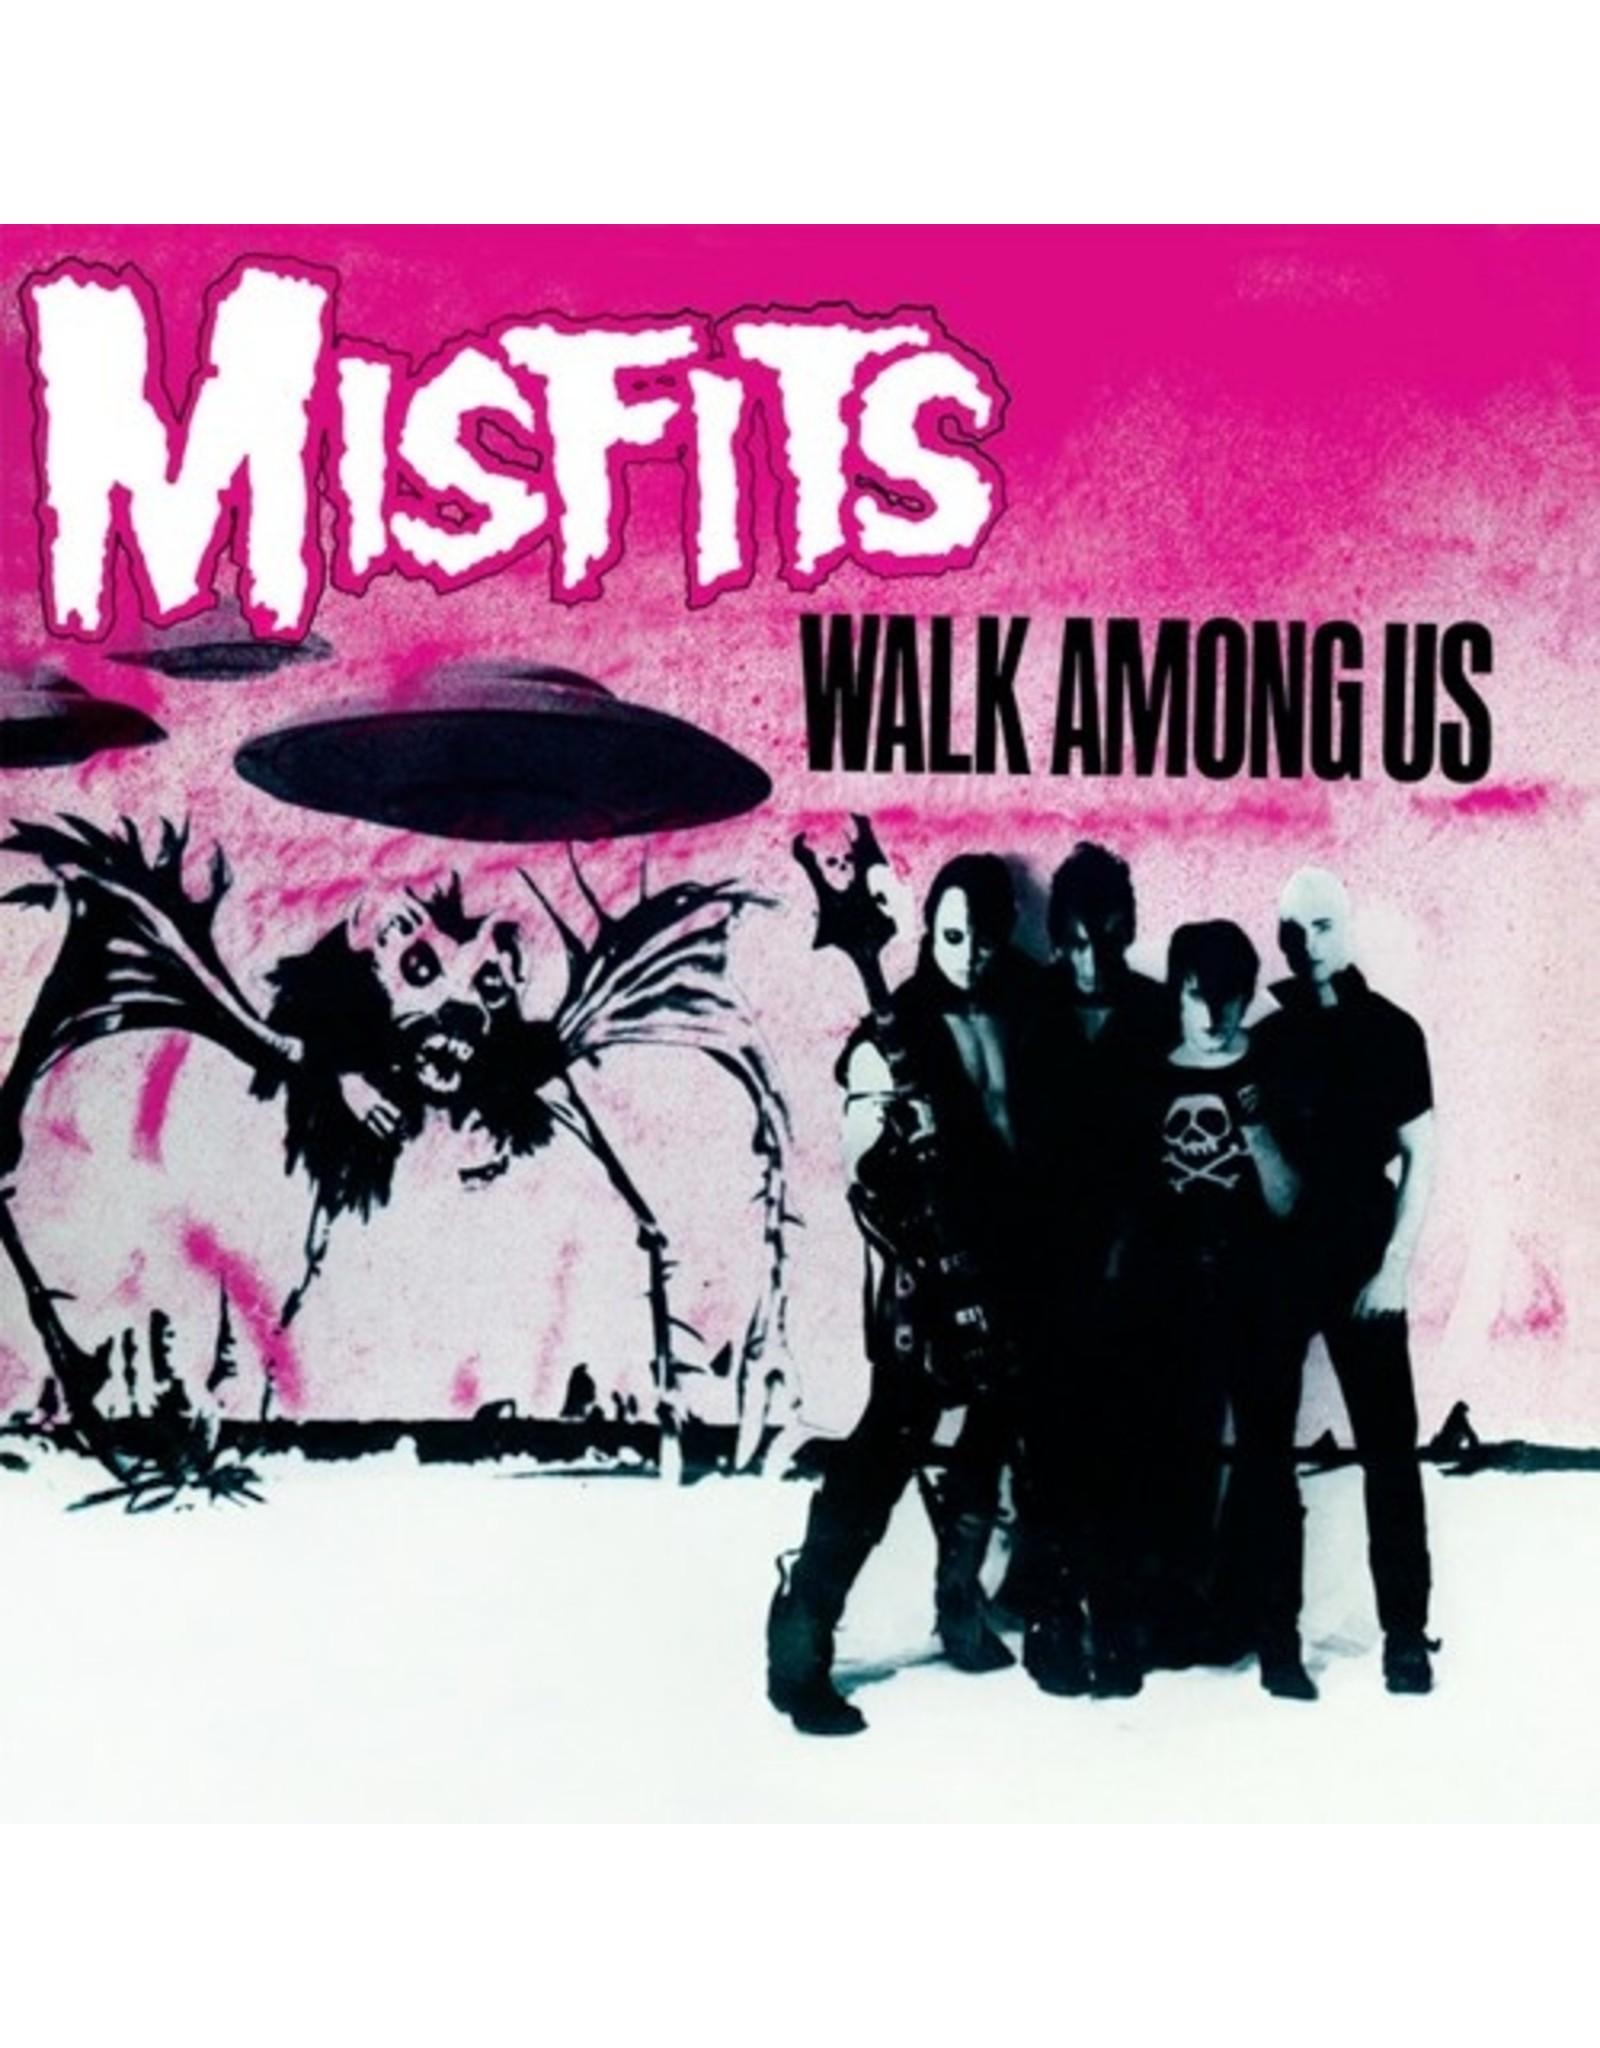 New Vinyl Misfits - Walk Among Us LP